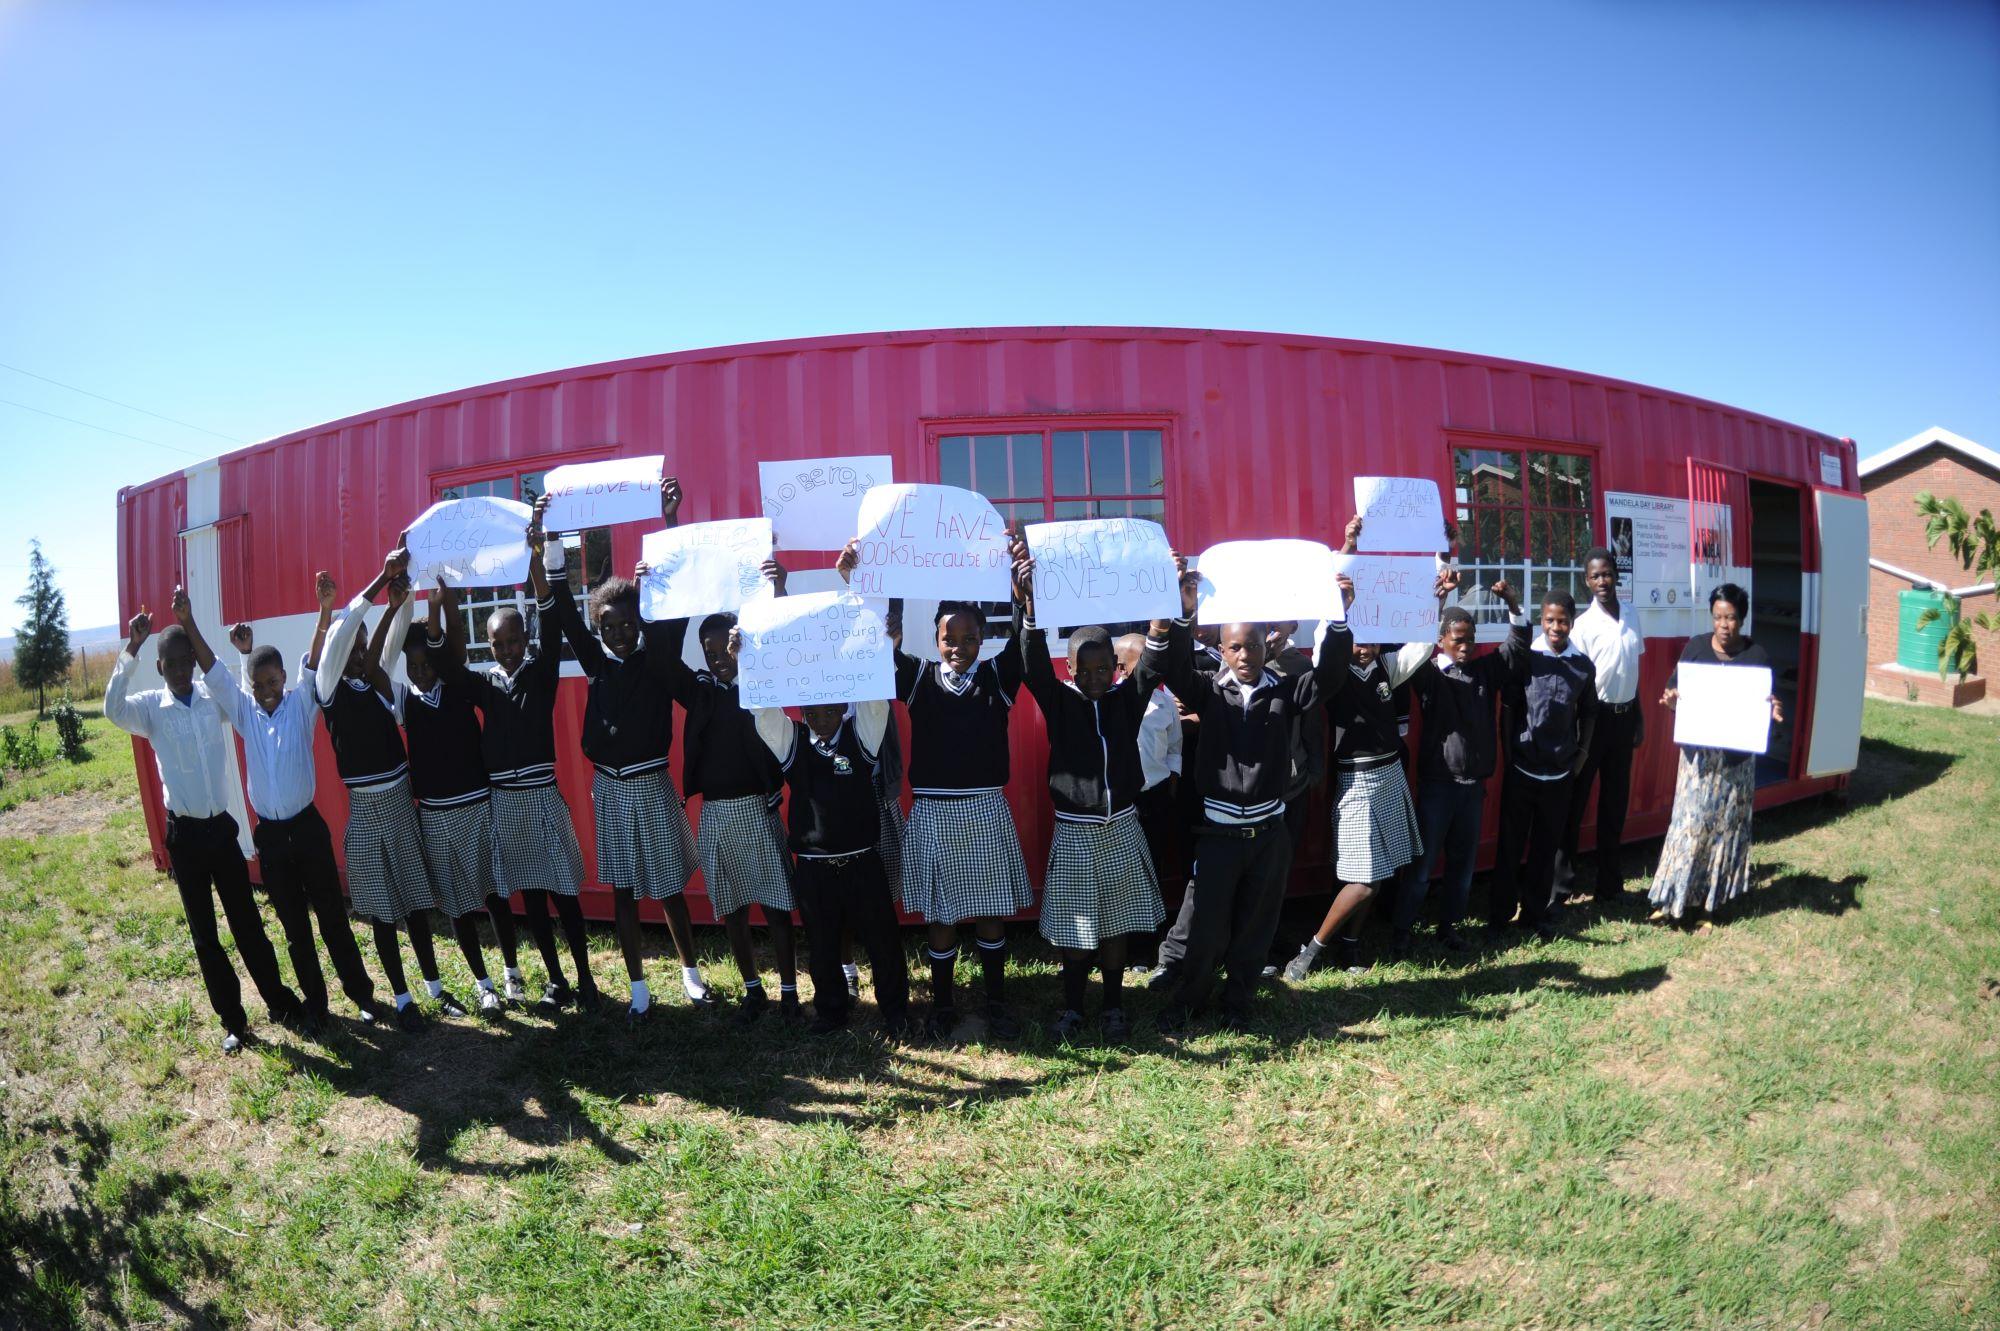 Nelson Mandela Day Project